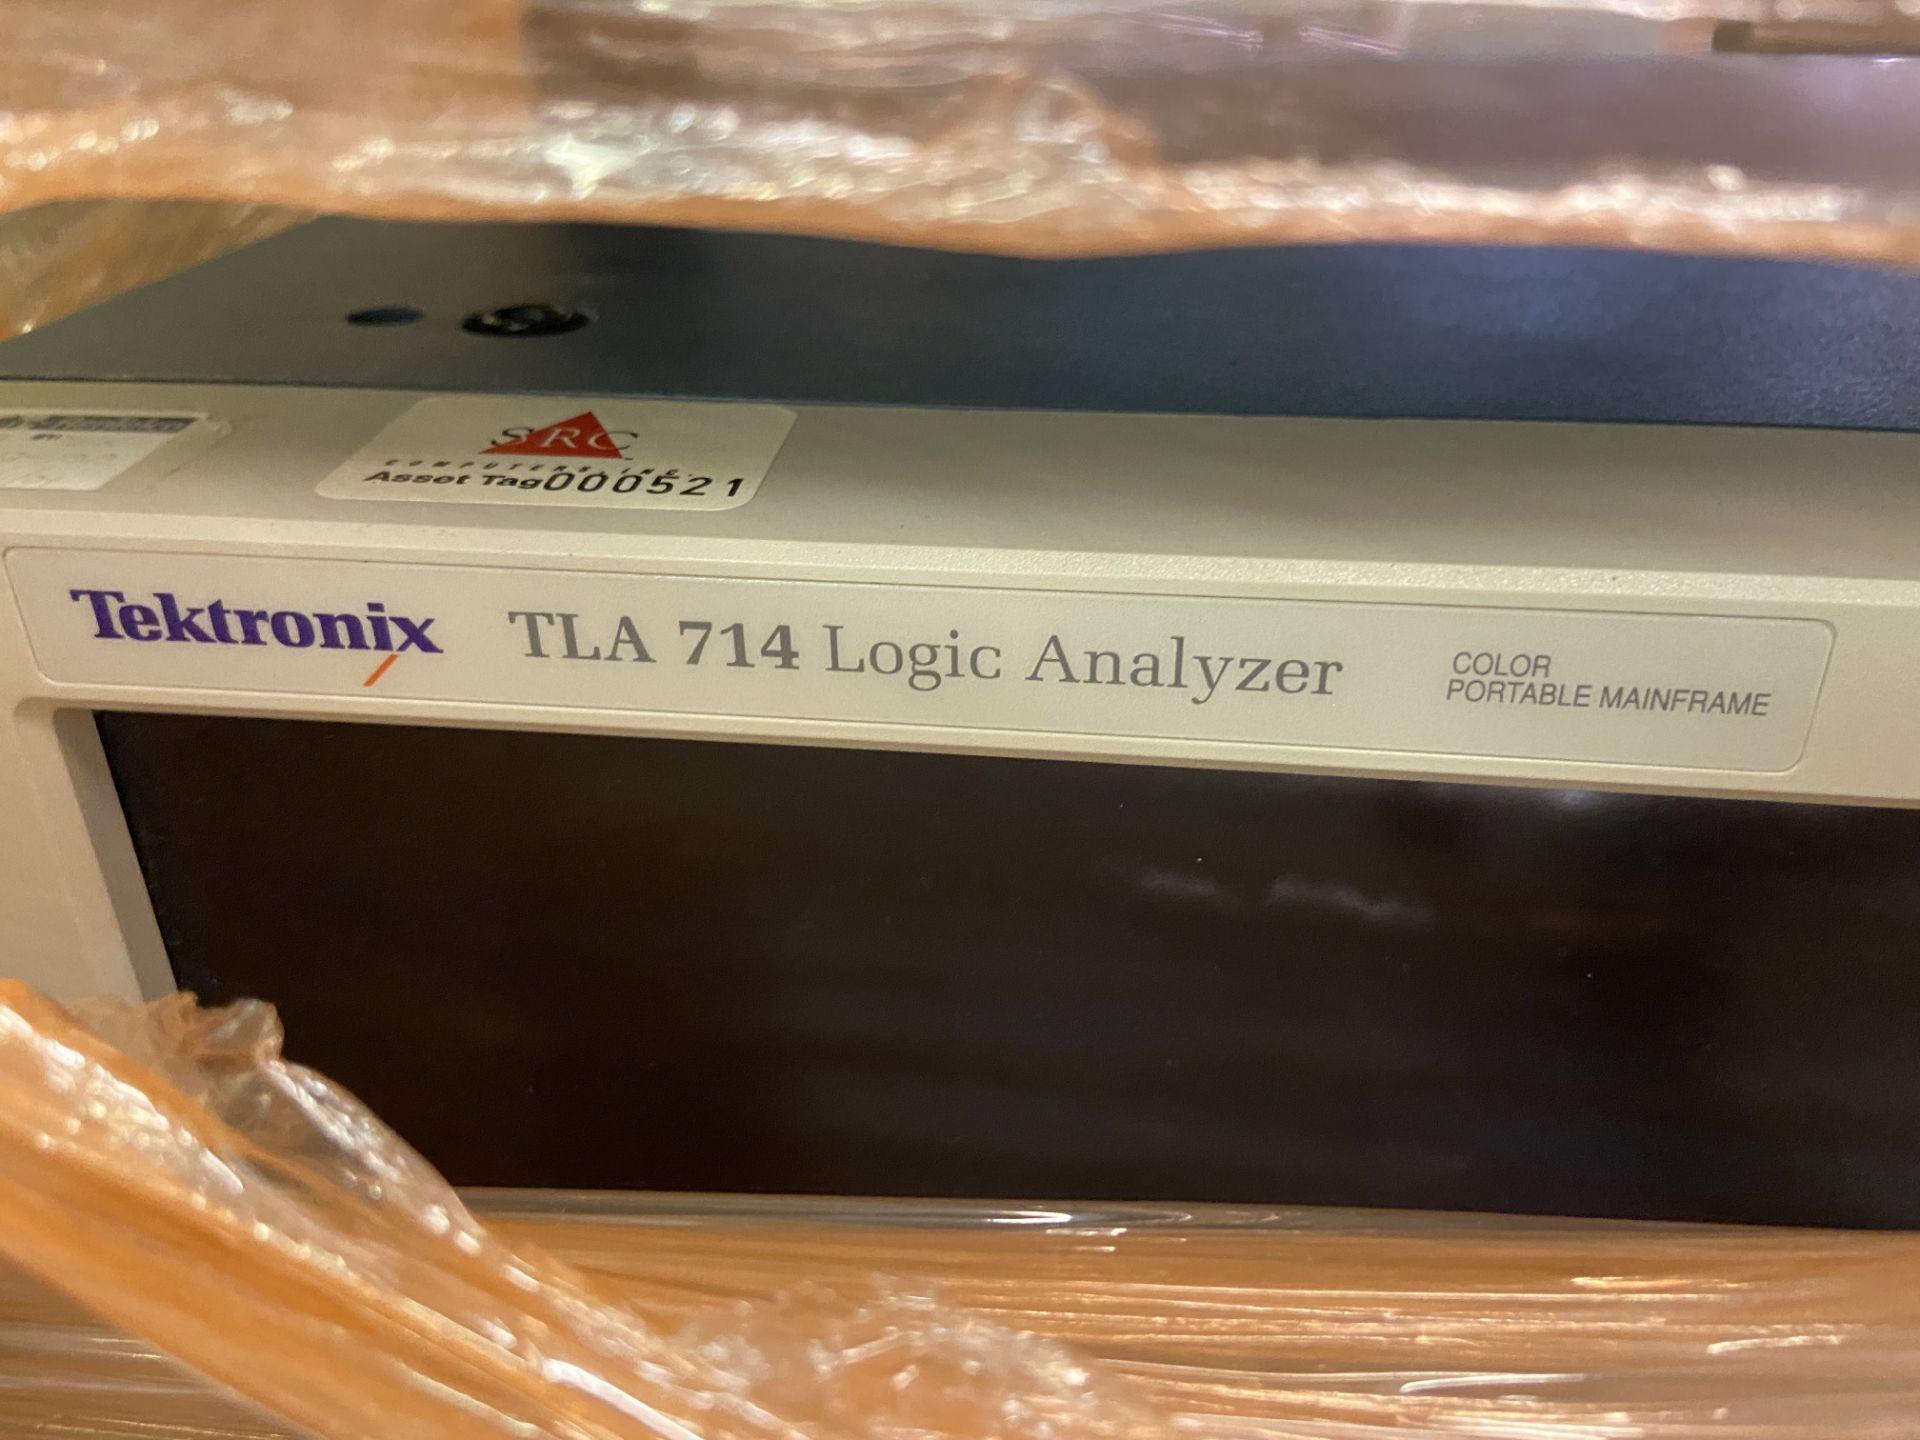 Tektronix TLA 714 Logic Analyzer, Rigging/ Loading Fee: $50